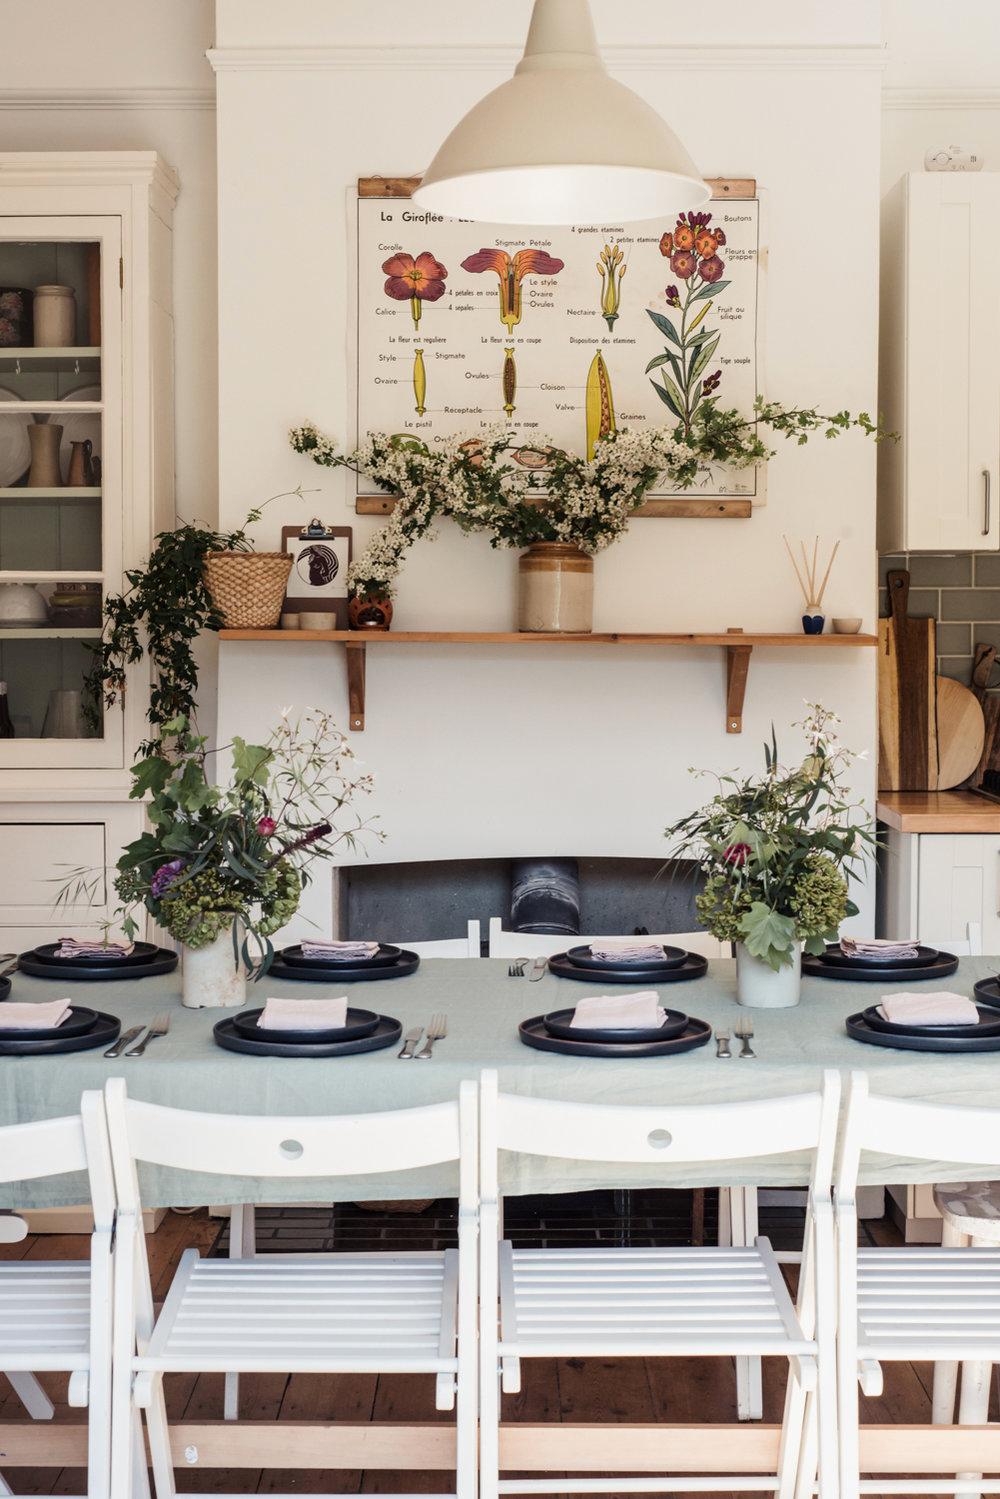 Fall 2016 Decorative Arts Instyle Home & Design Magazine